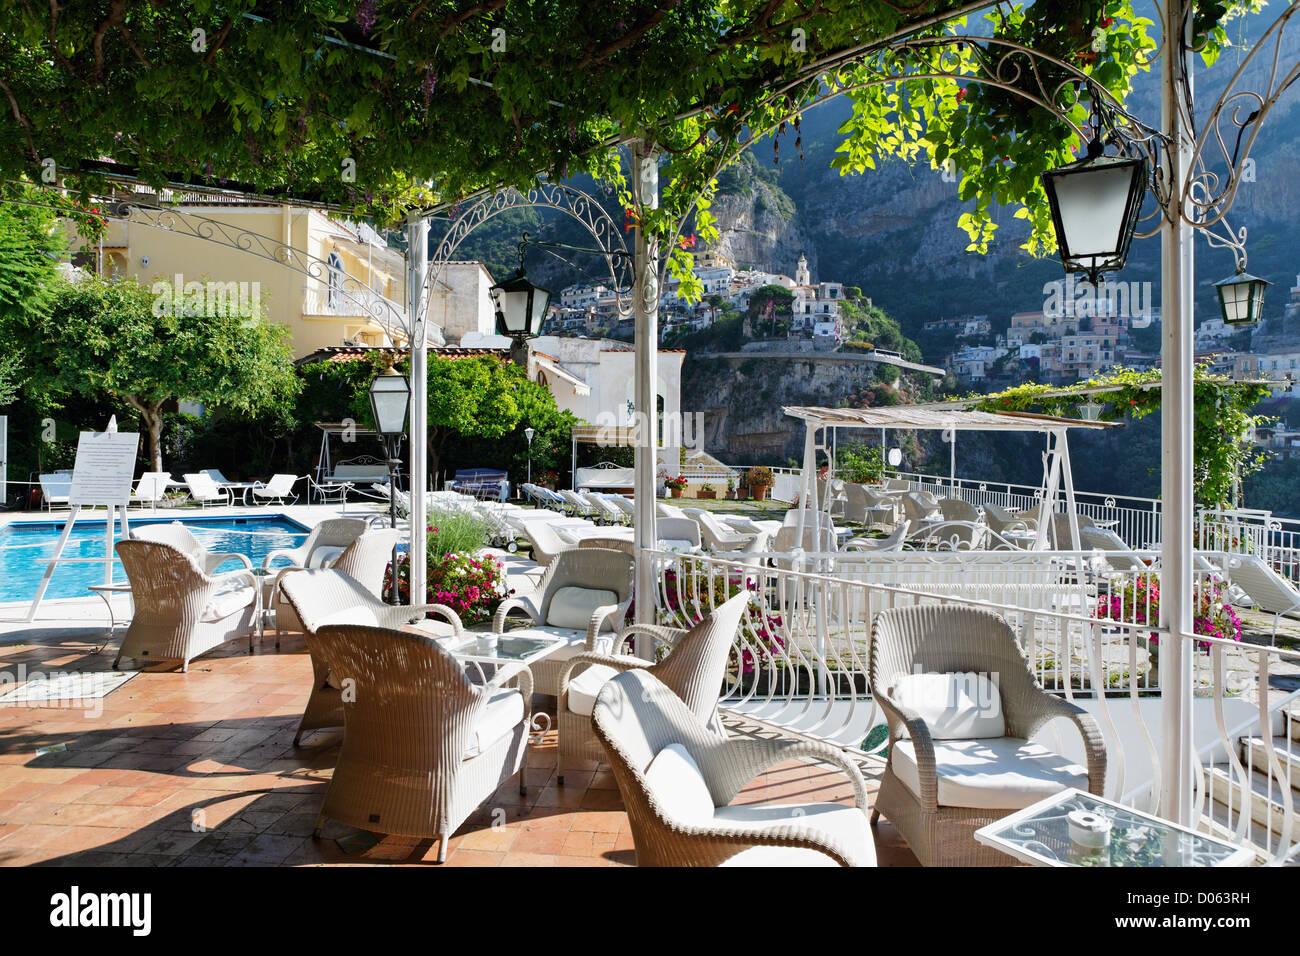 Uberdachte Terrasse Mit Einem Pool Hotel Poseidon In Positano